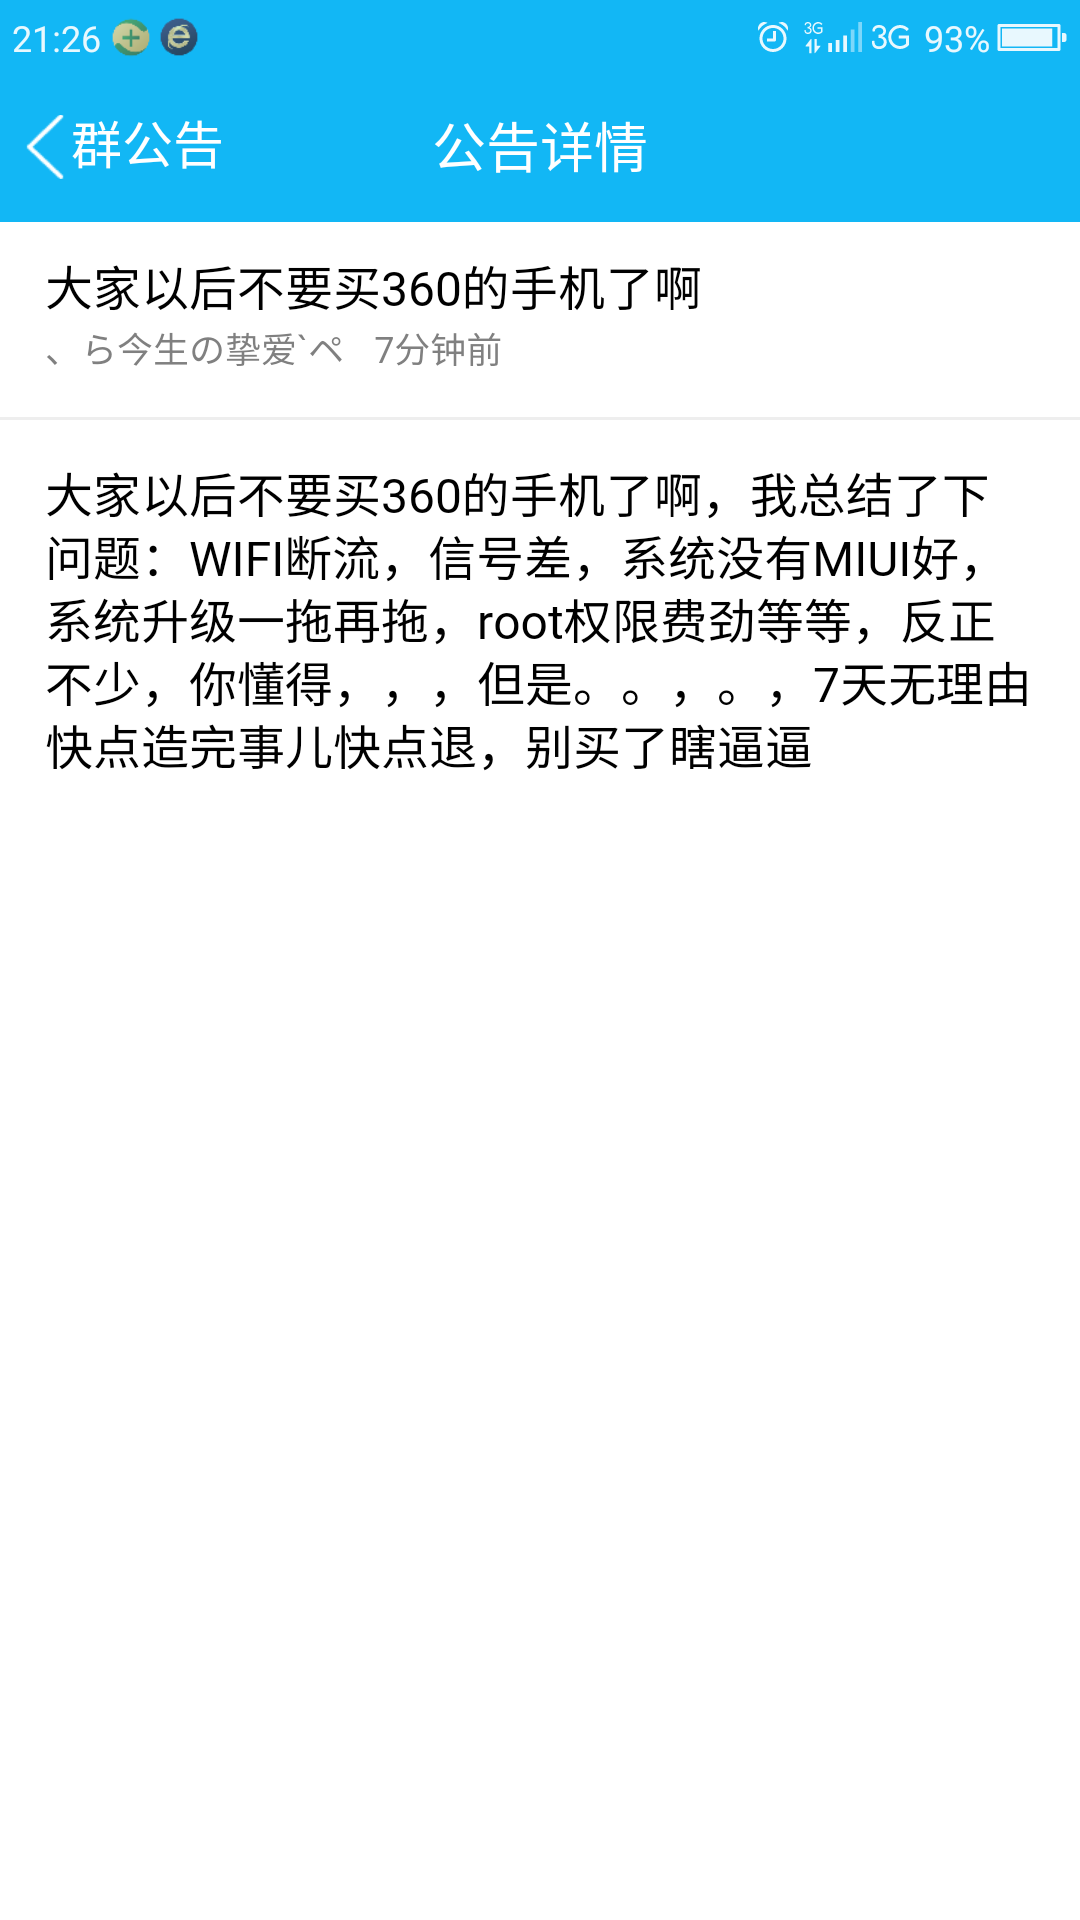 Screenshot_2017-01-23-21-26-07.png